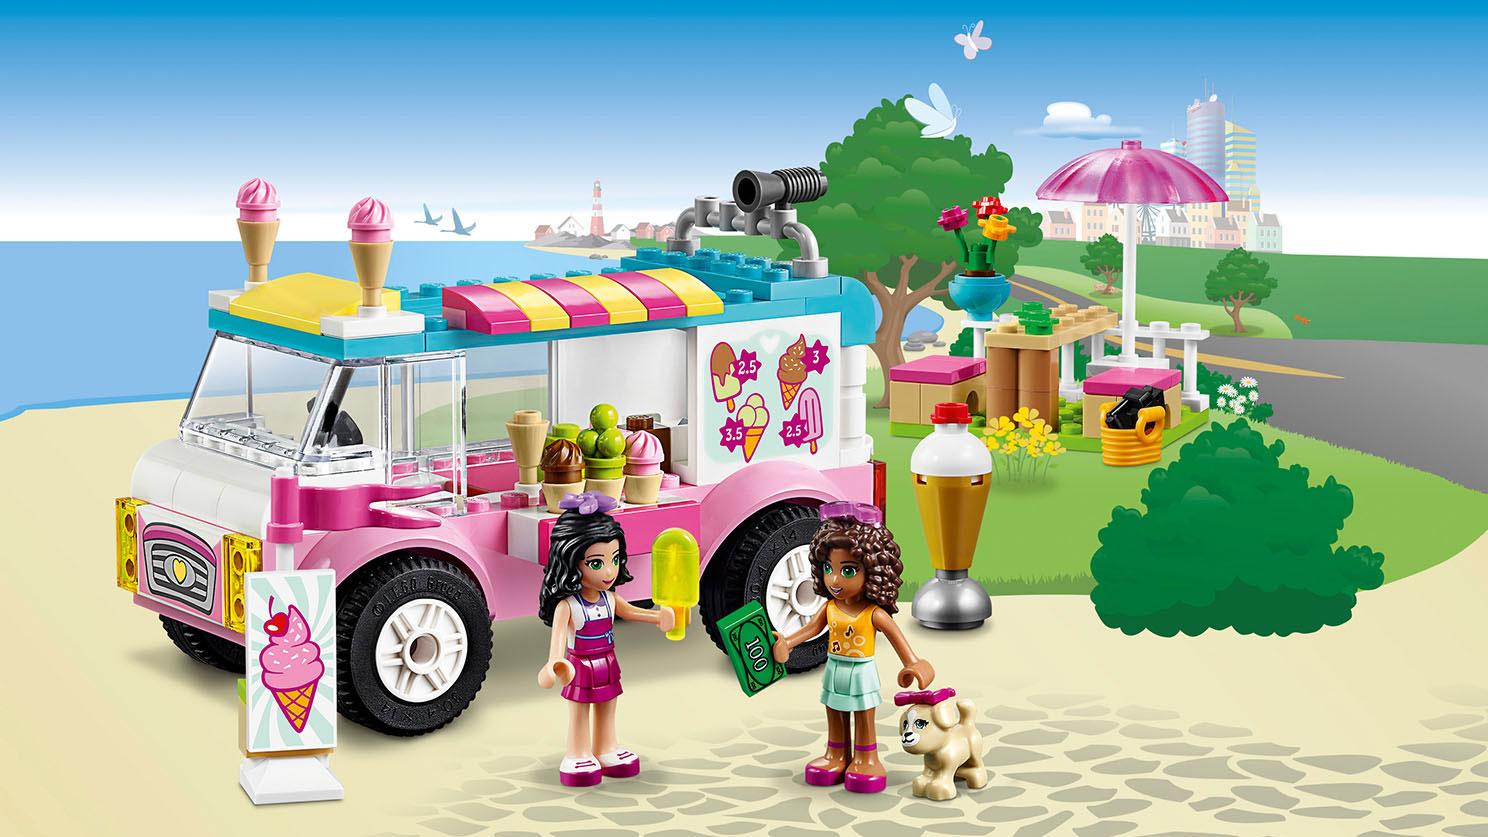 10727 la camionnette de glaces d 39 emma wiki lego fandom powered by wikia. Black Bedroom Furniture Sets. Home Design Ideas